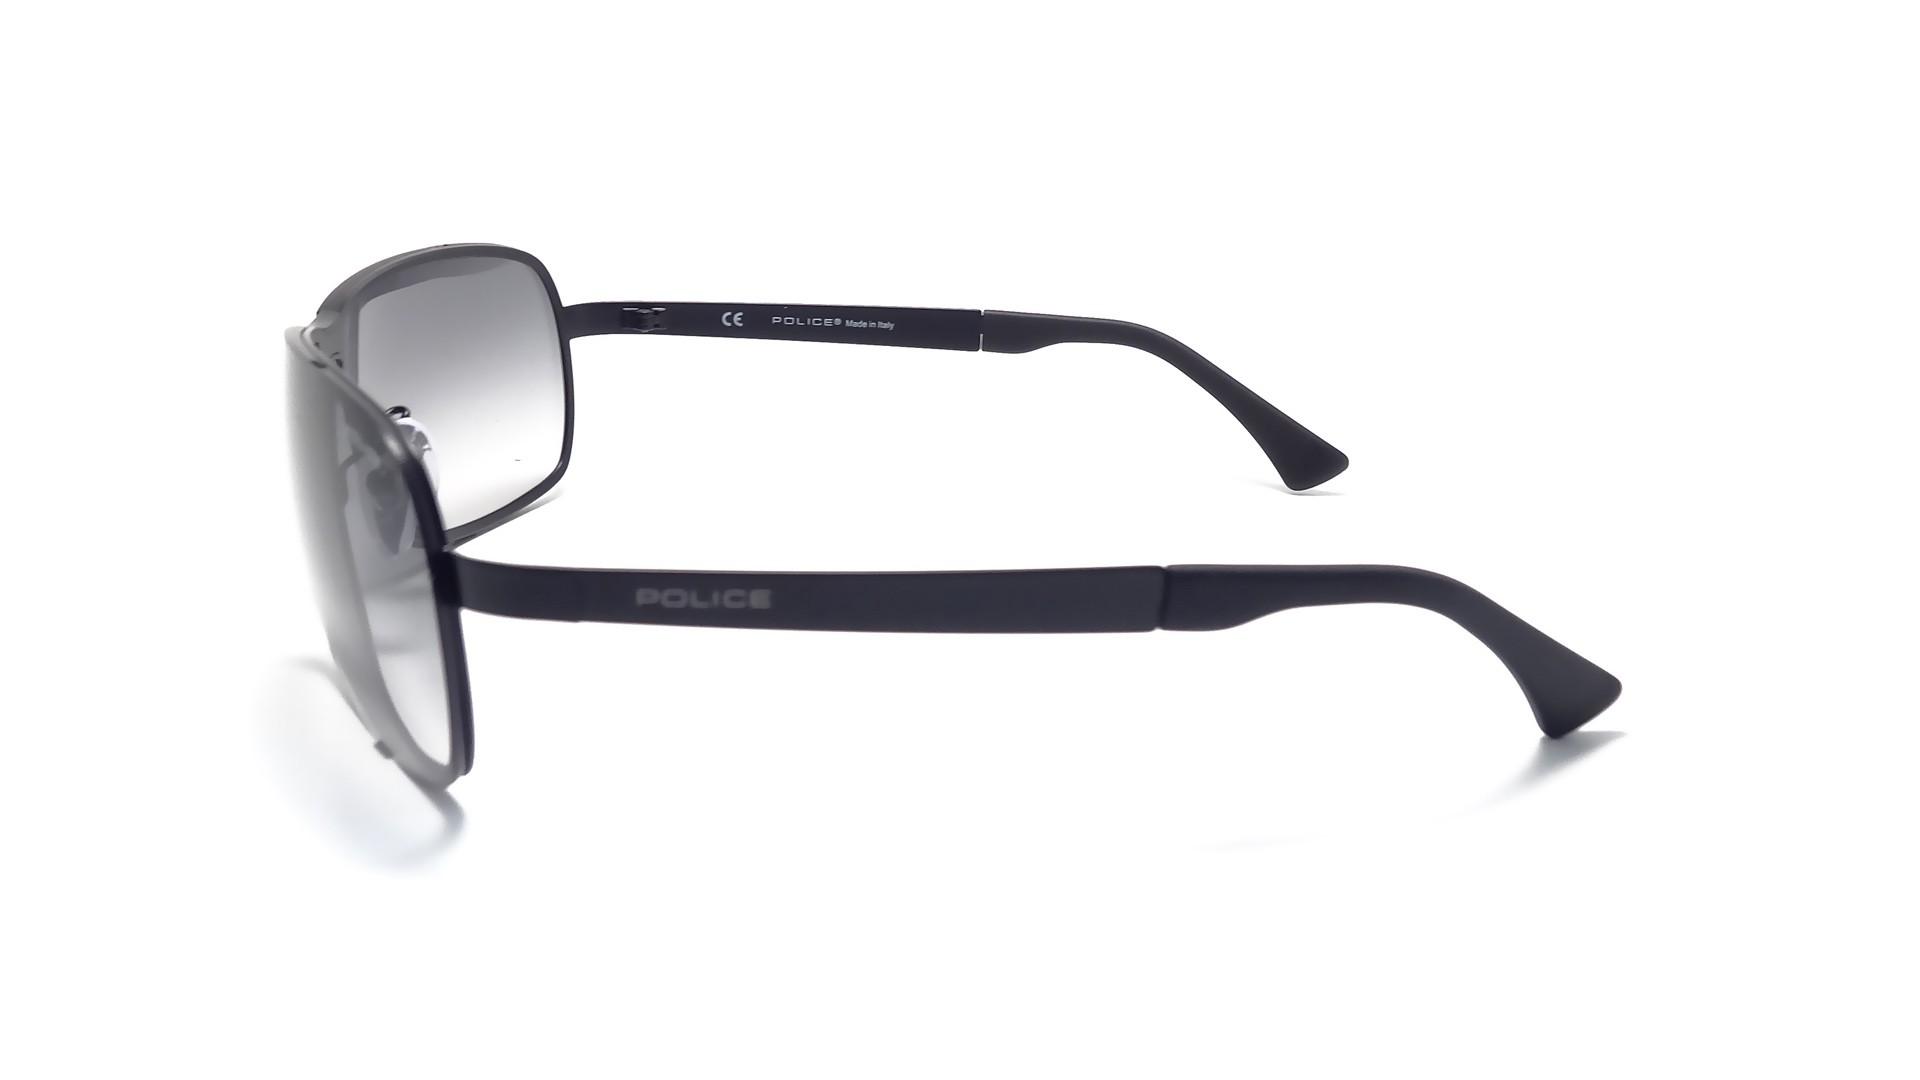 34ee8e0b8be Pepe Jeans Aviator Sunglasses (gunmetal) (pj5078 C2 61)